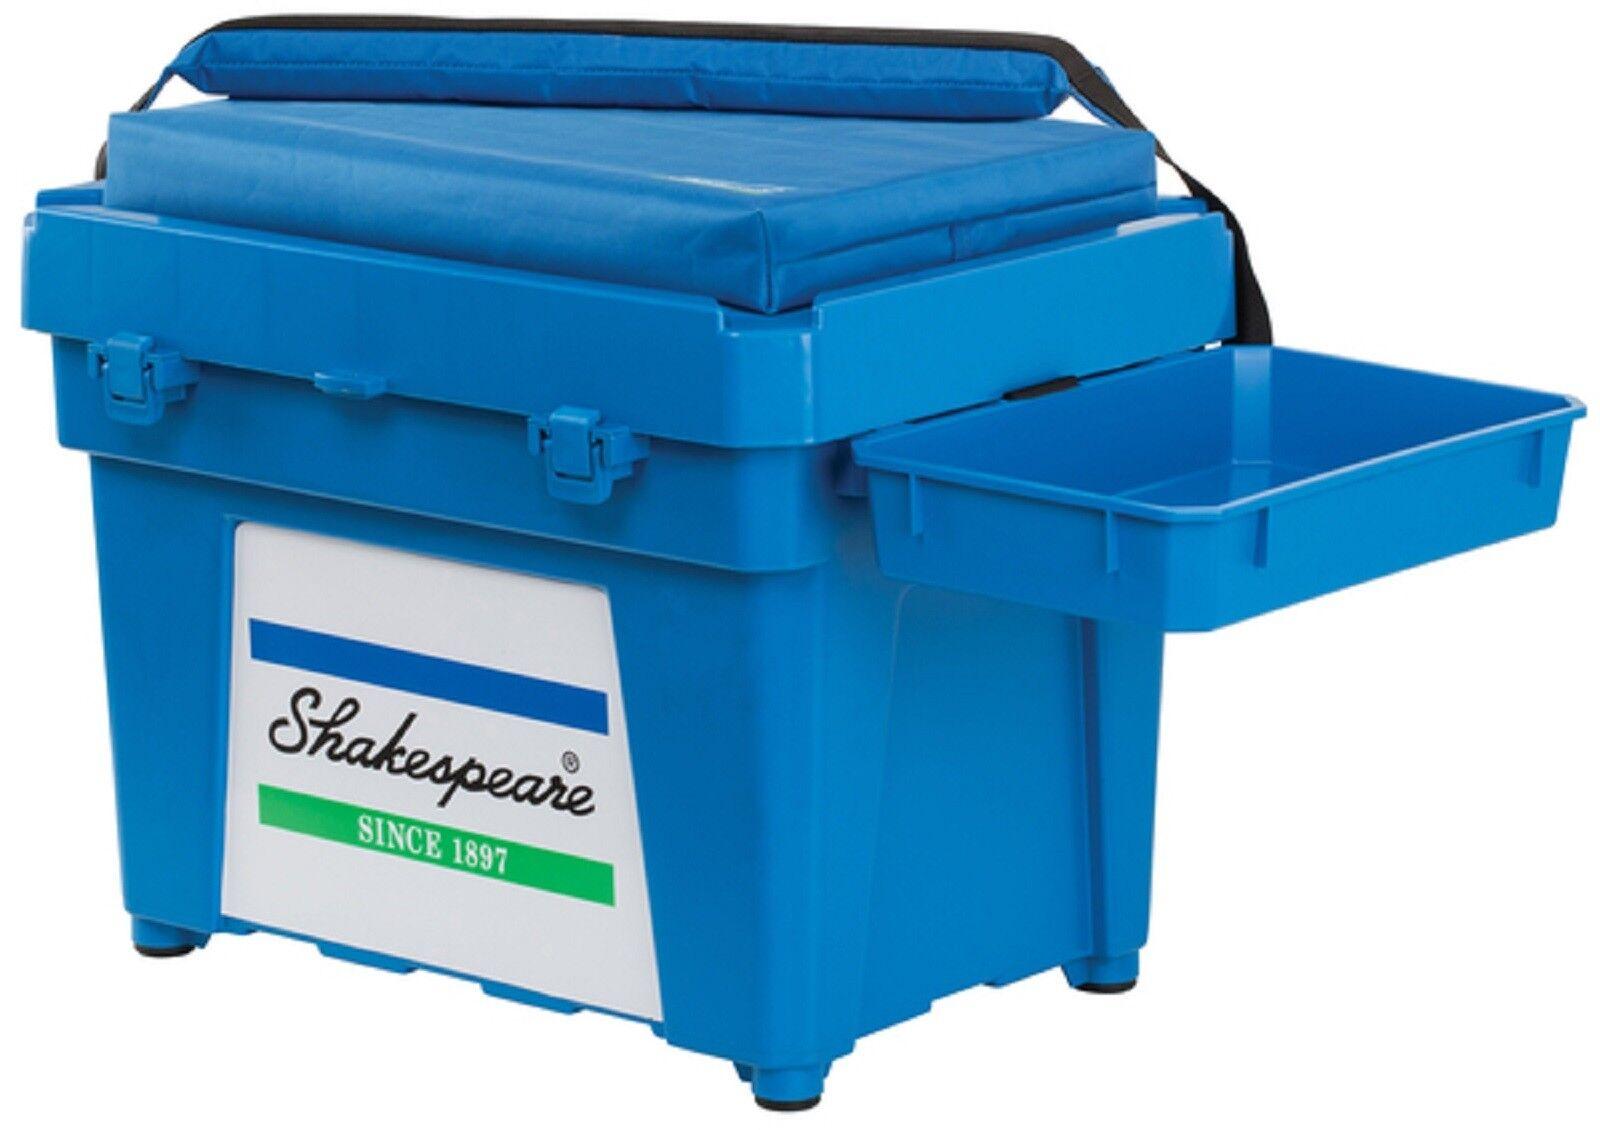 SQUADRA Blu di Shakespeare Pesca Scatola Sedile Cuscino imbottito Cinghia Cinghia Cinghia Laterale Vassoio e scatola 33f0ca